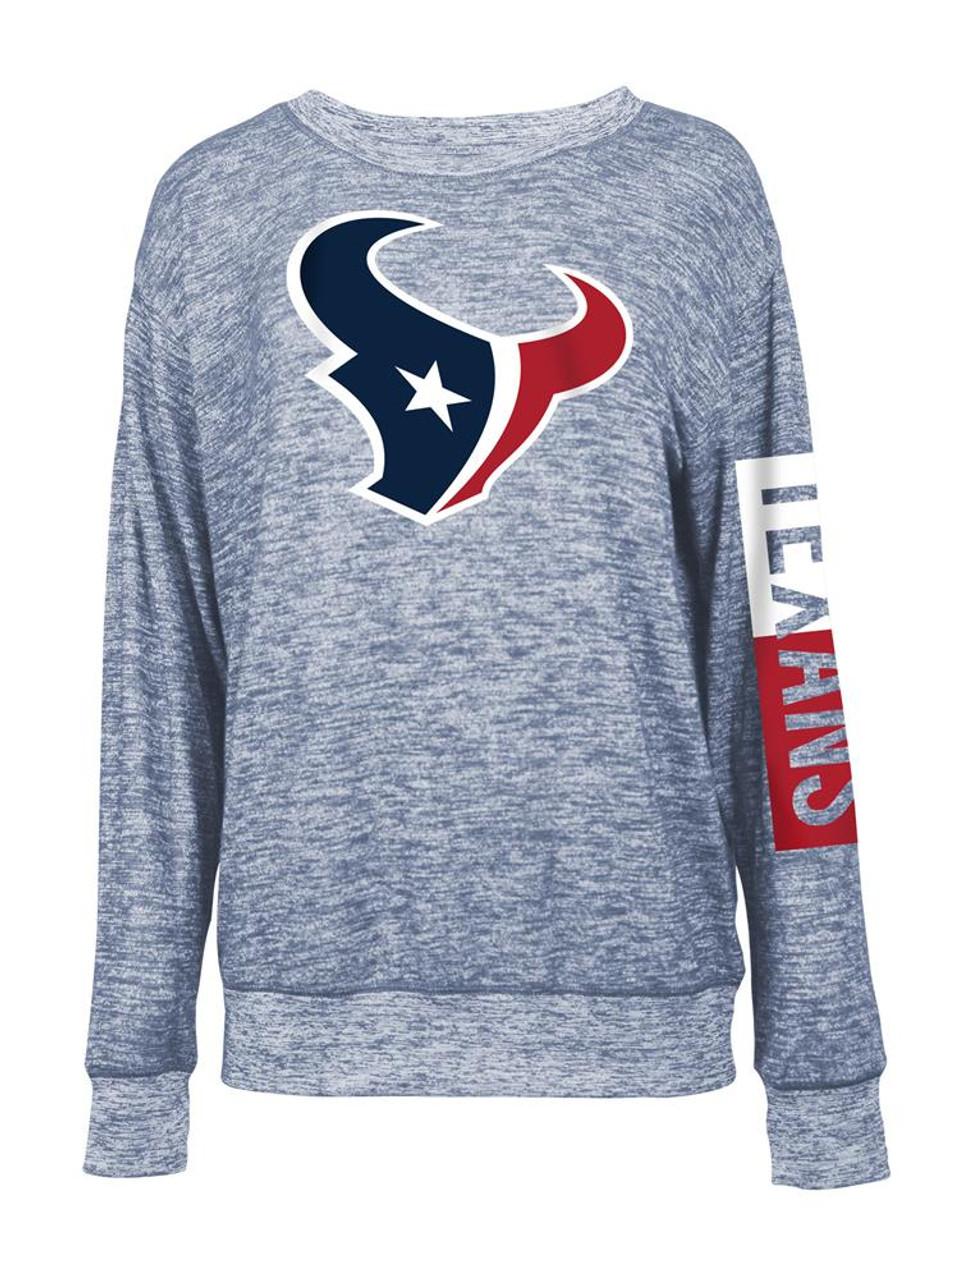 Houston Texans Sweater Women's Knit Pullover